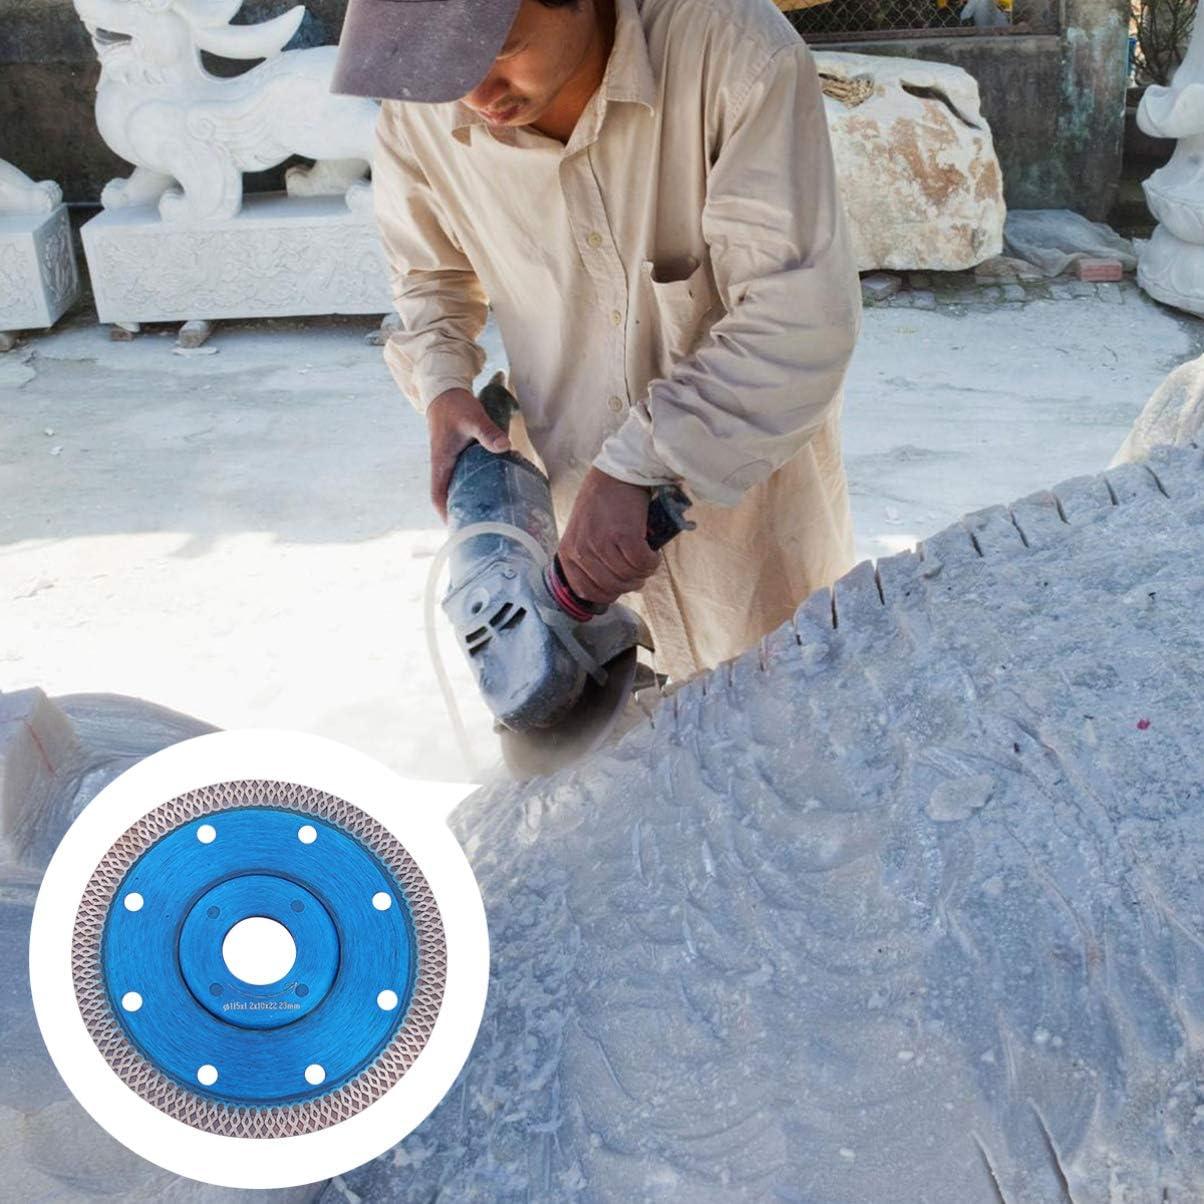 ULTECHNOVO Cuchilla de Corte de Baldosas Cuchilla de Diamante de Porcelana 115Mm Disco de Corte de Cer/ámica Muela de Granito Amoladora Angular de Cer/ámica Azul